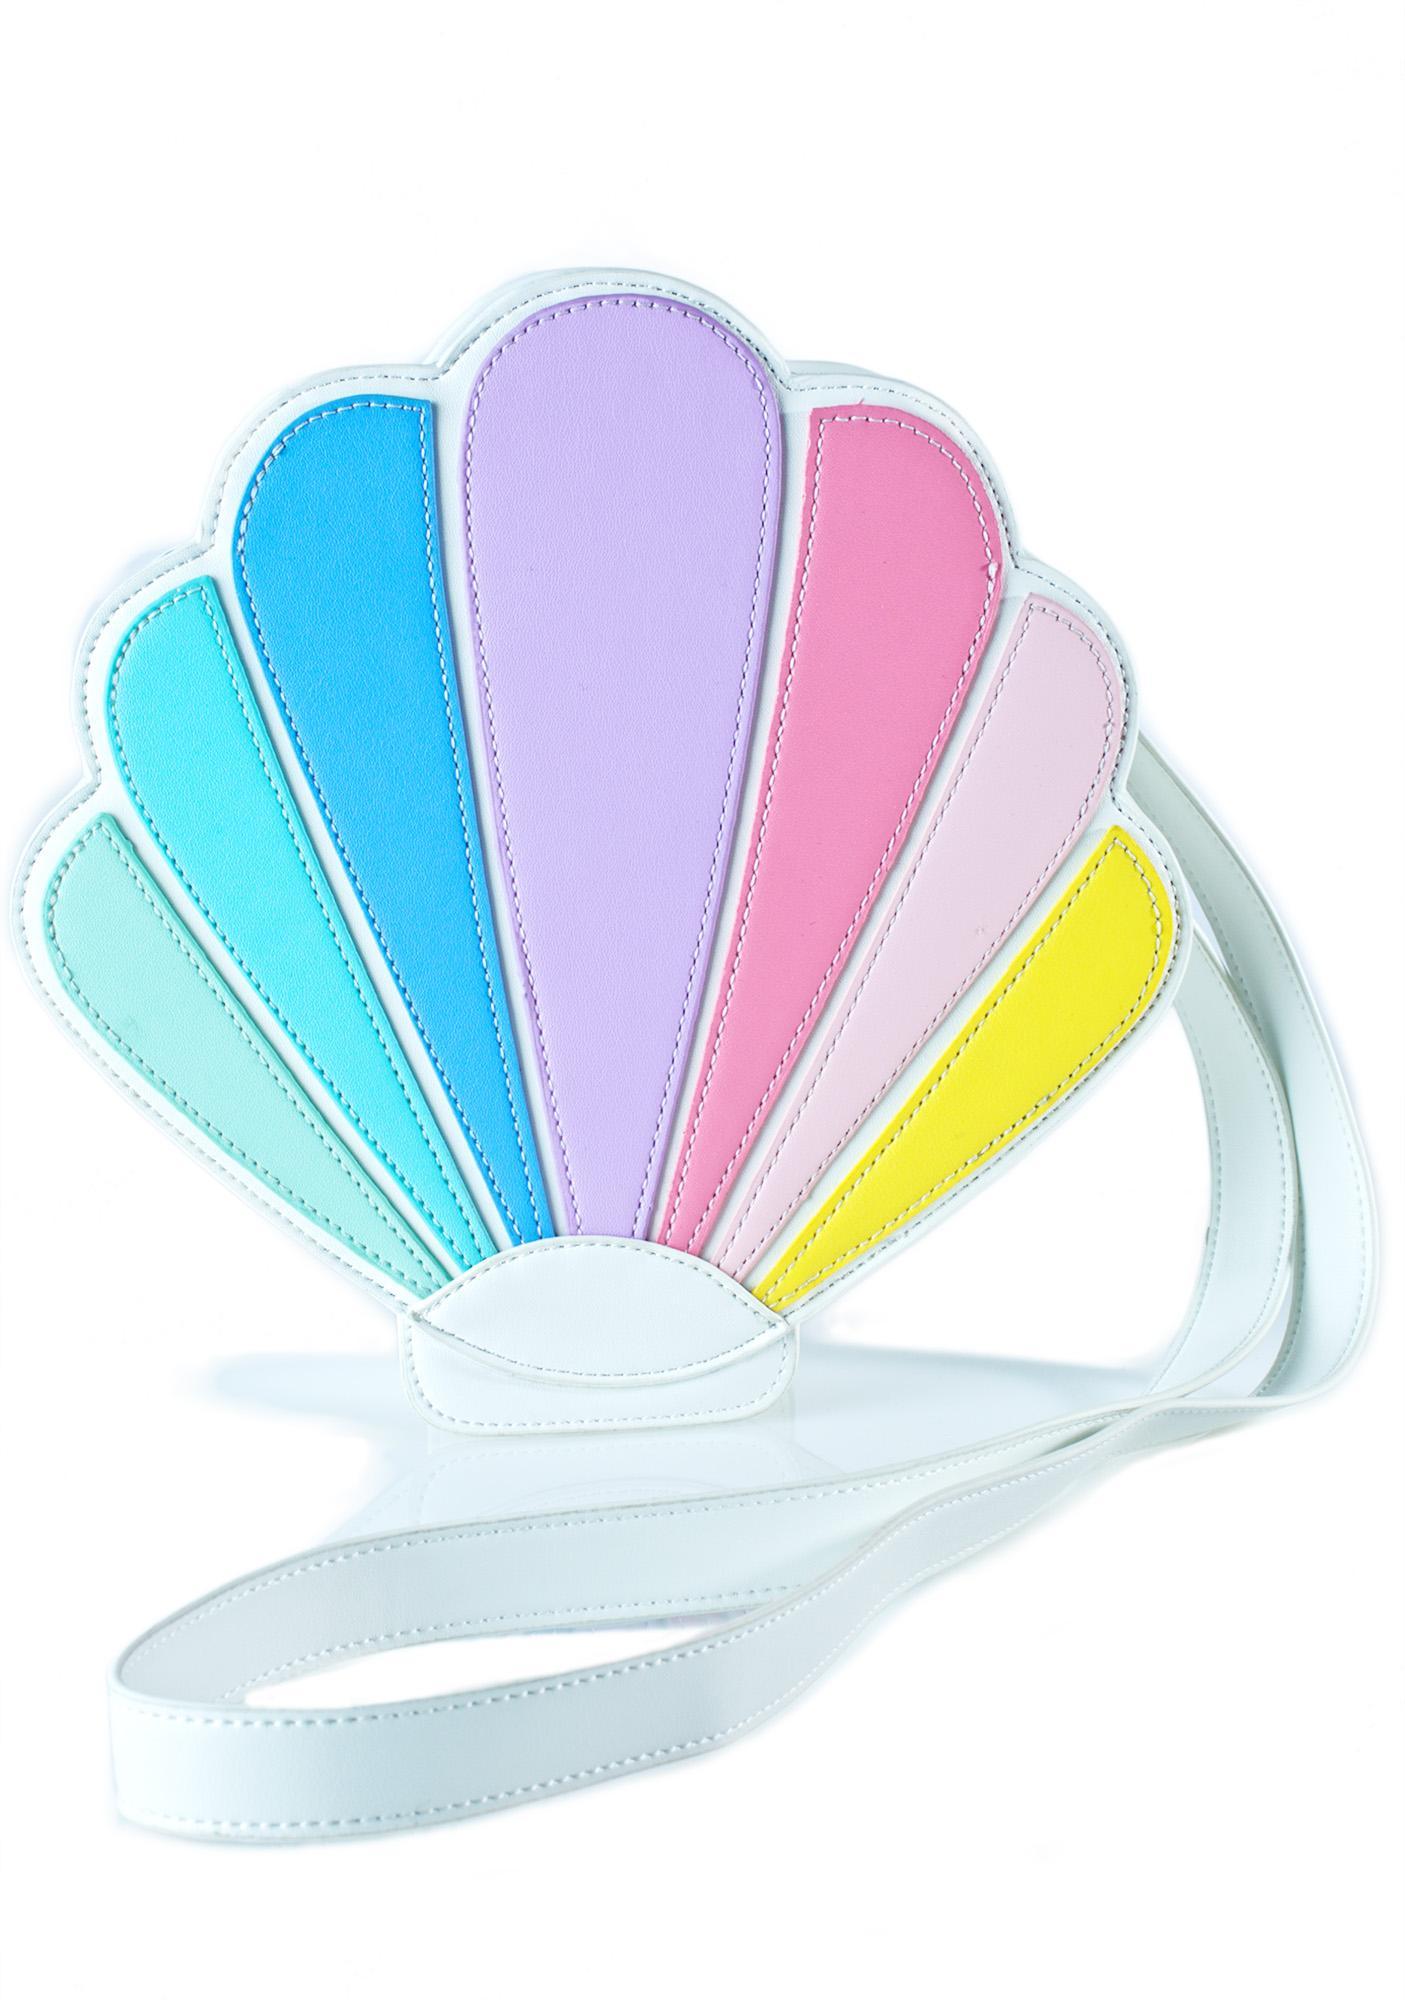 Sugar Thrillz Over The Rainbow Seashell Bag